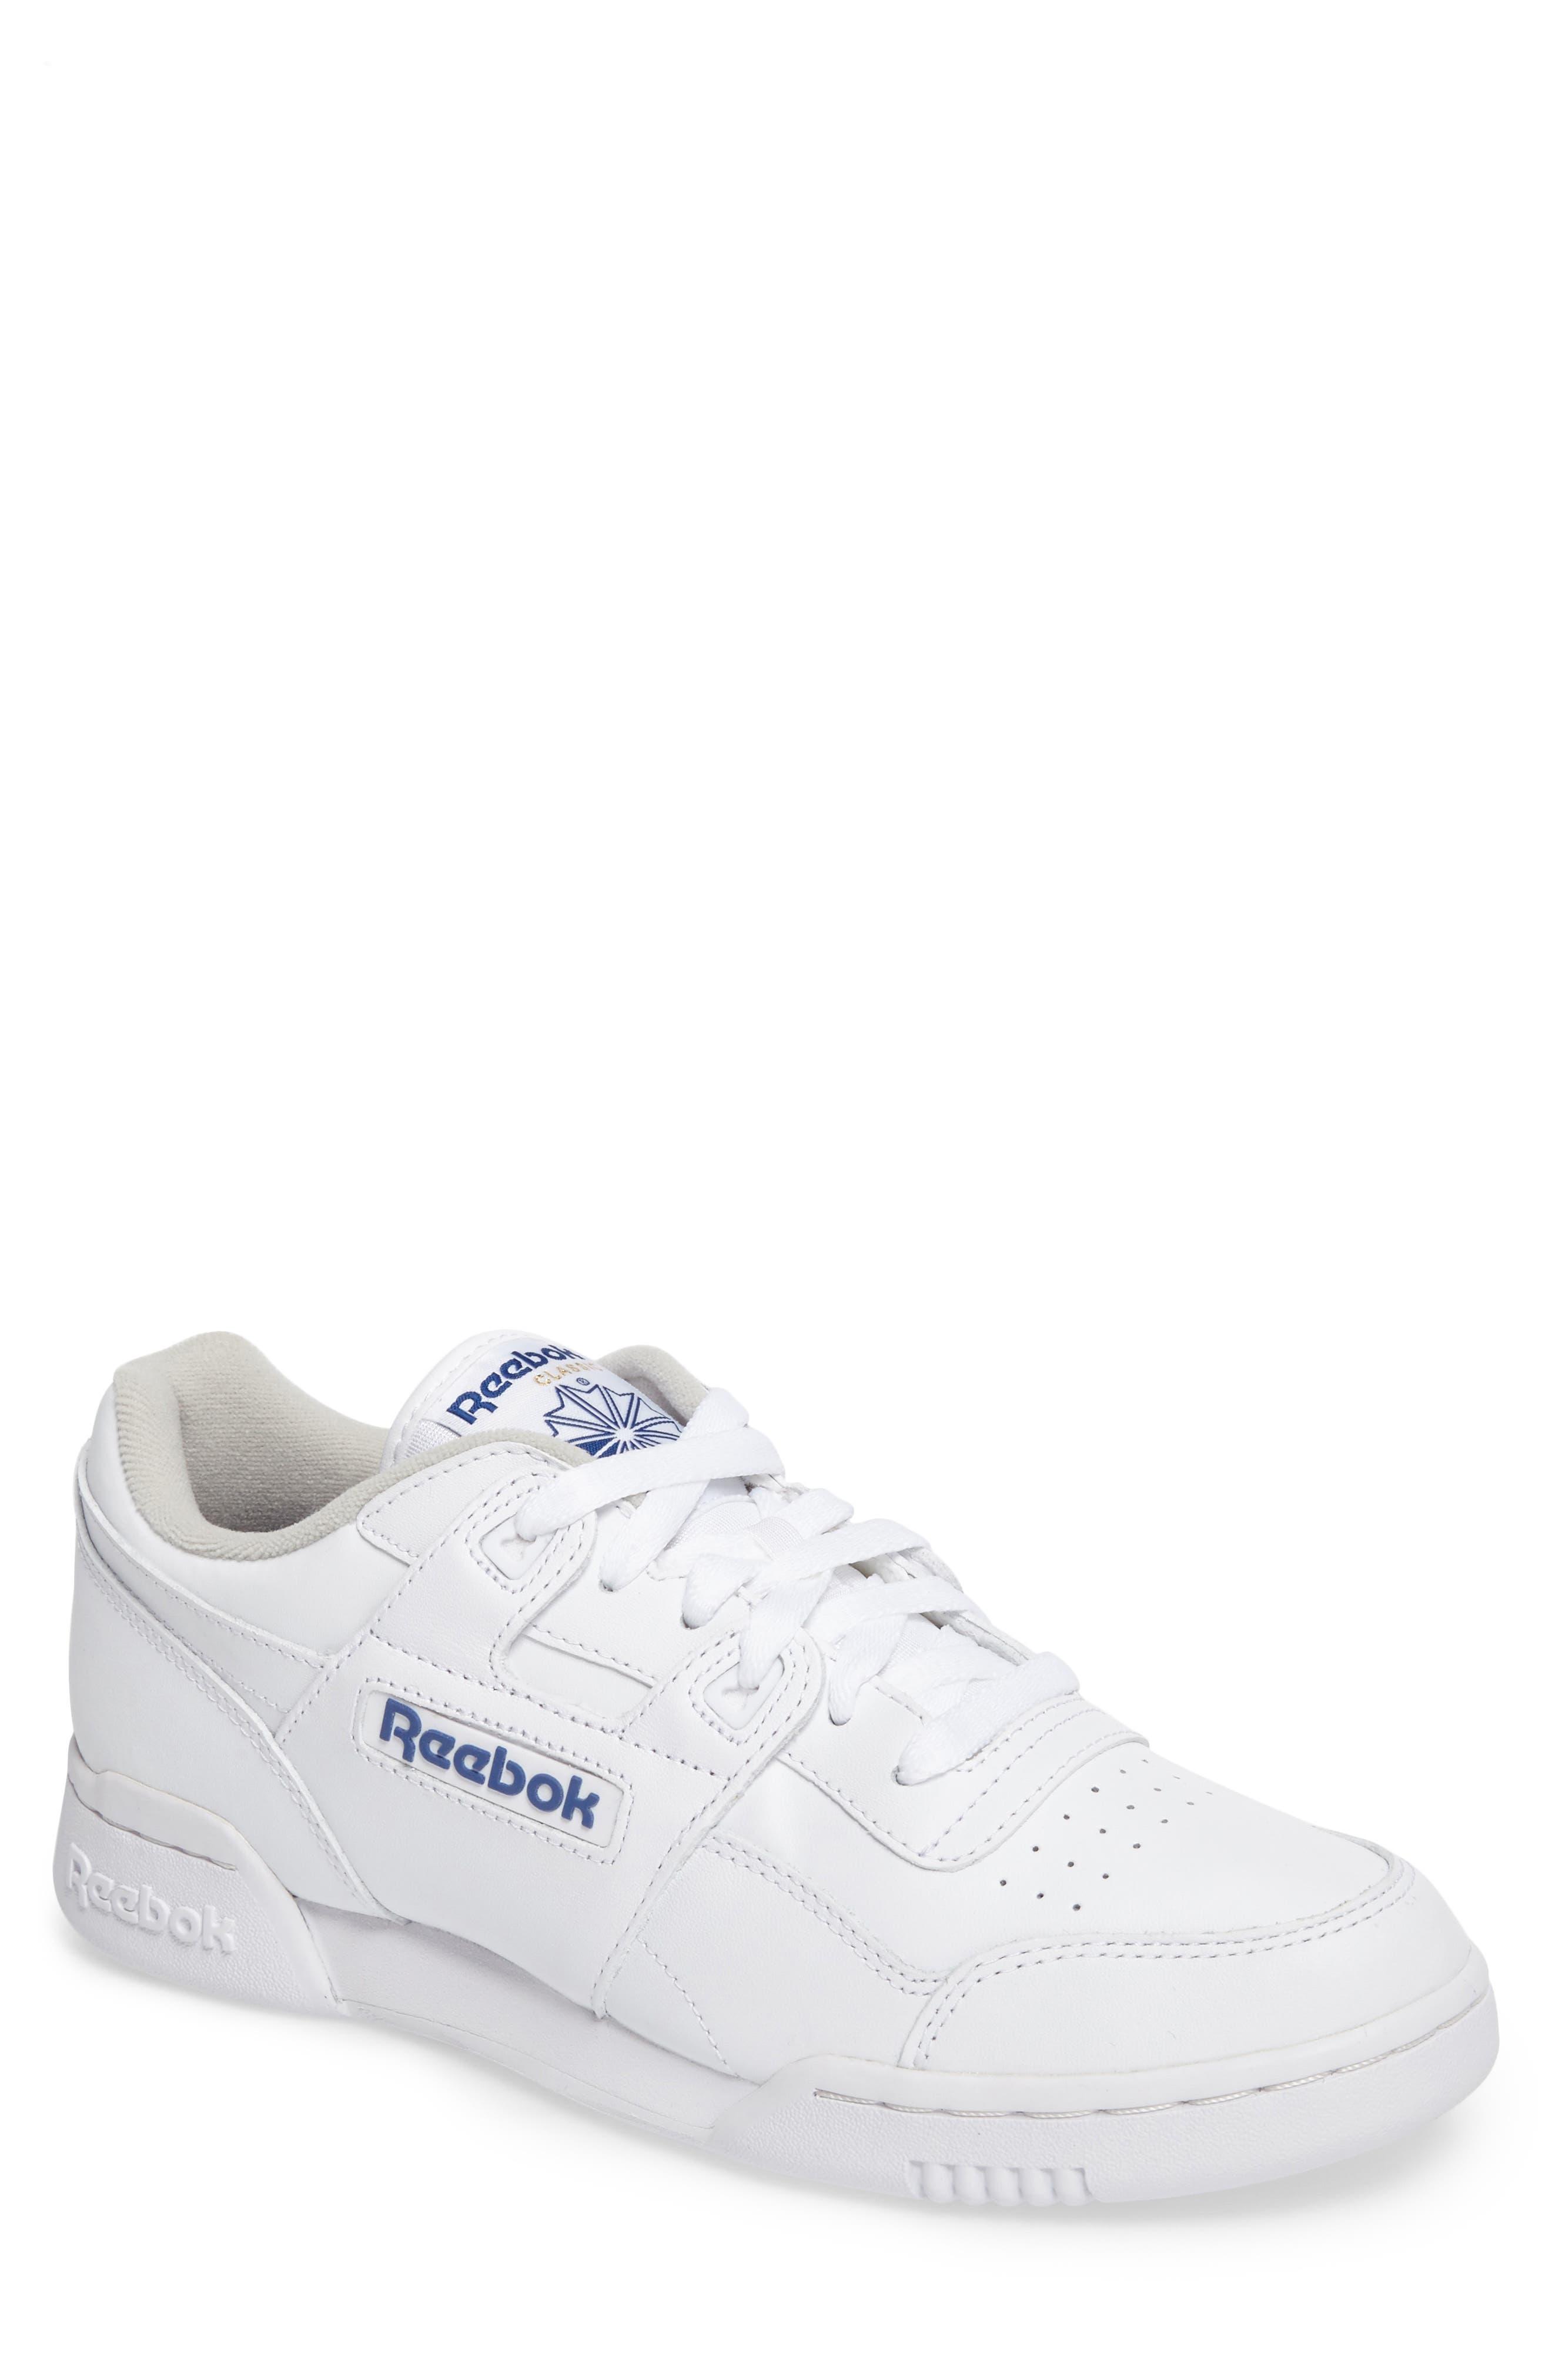 Workout Plus Sneaker,                         Main,                         color, WHITE/ ROYAL